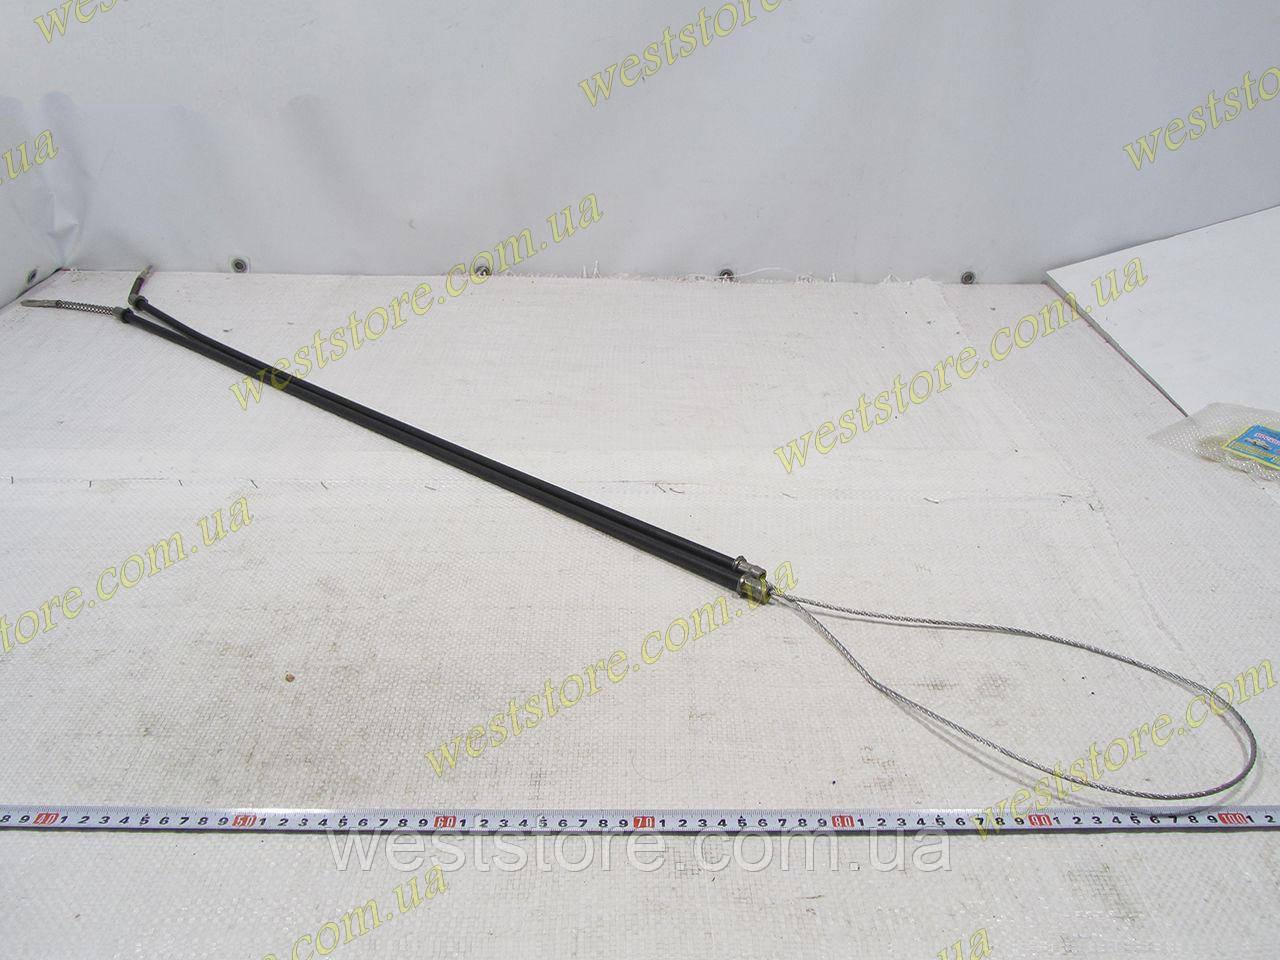 Трос ручного тормоза ручника Заз 1102,1103 Таврия Славута